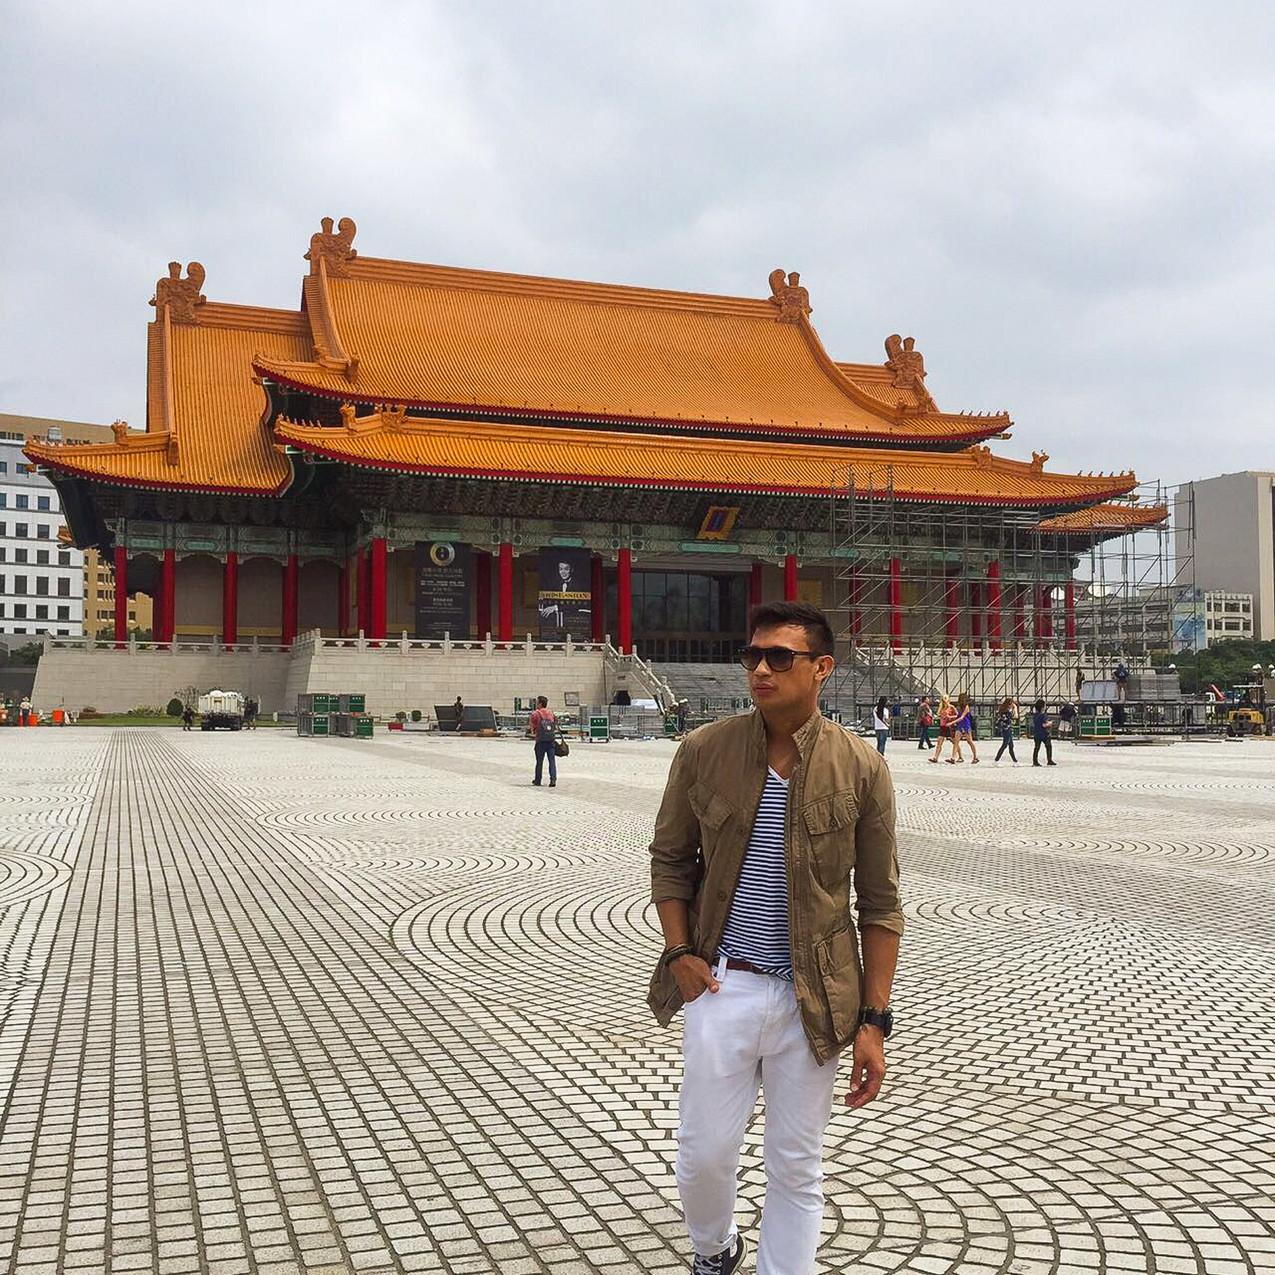 Chaing Kai-Shek Memorial Hall